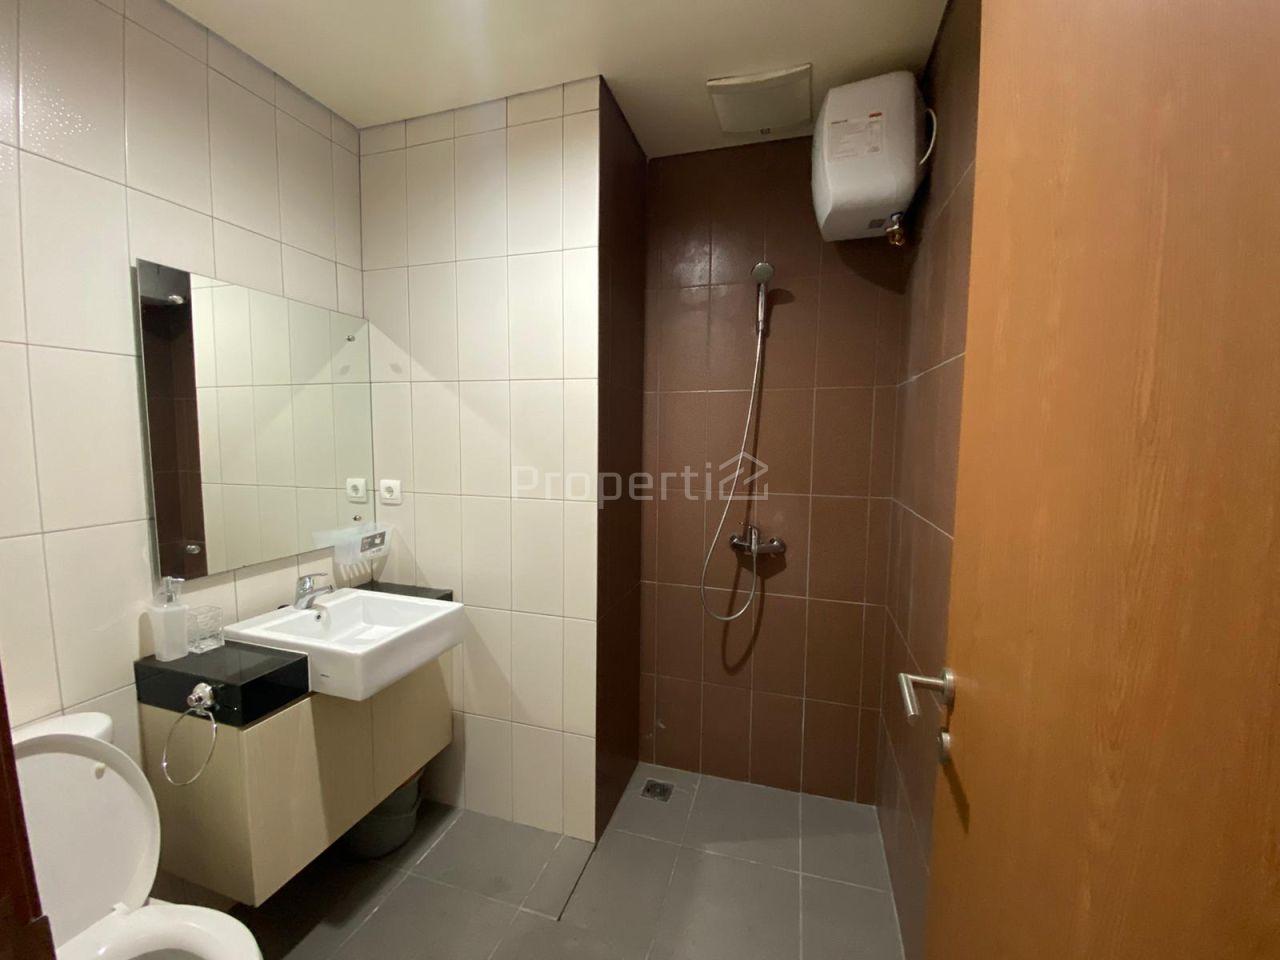 New Apartment Unit at Dago Suites Apartment, 3rd Floor, Kota Bandung